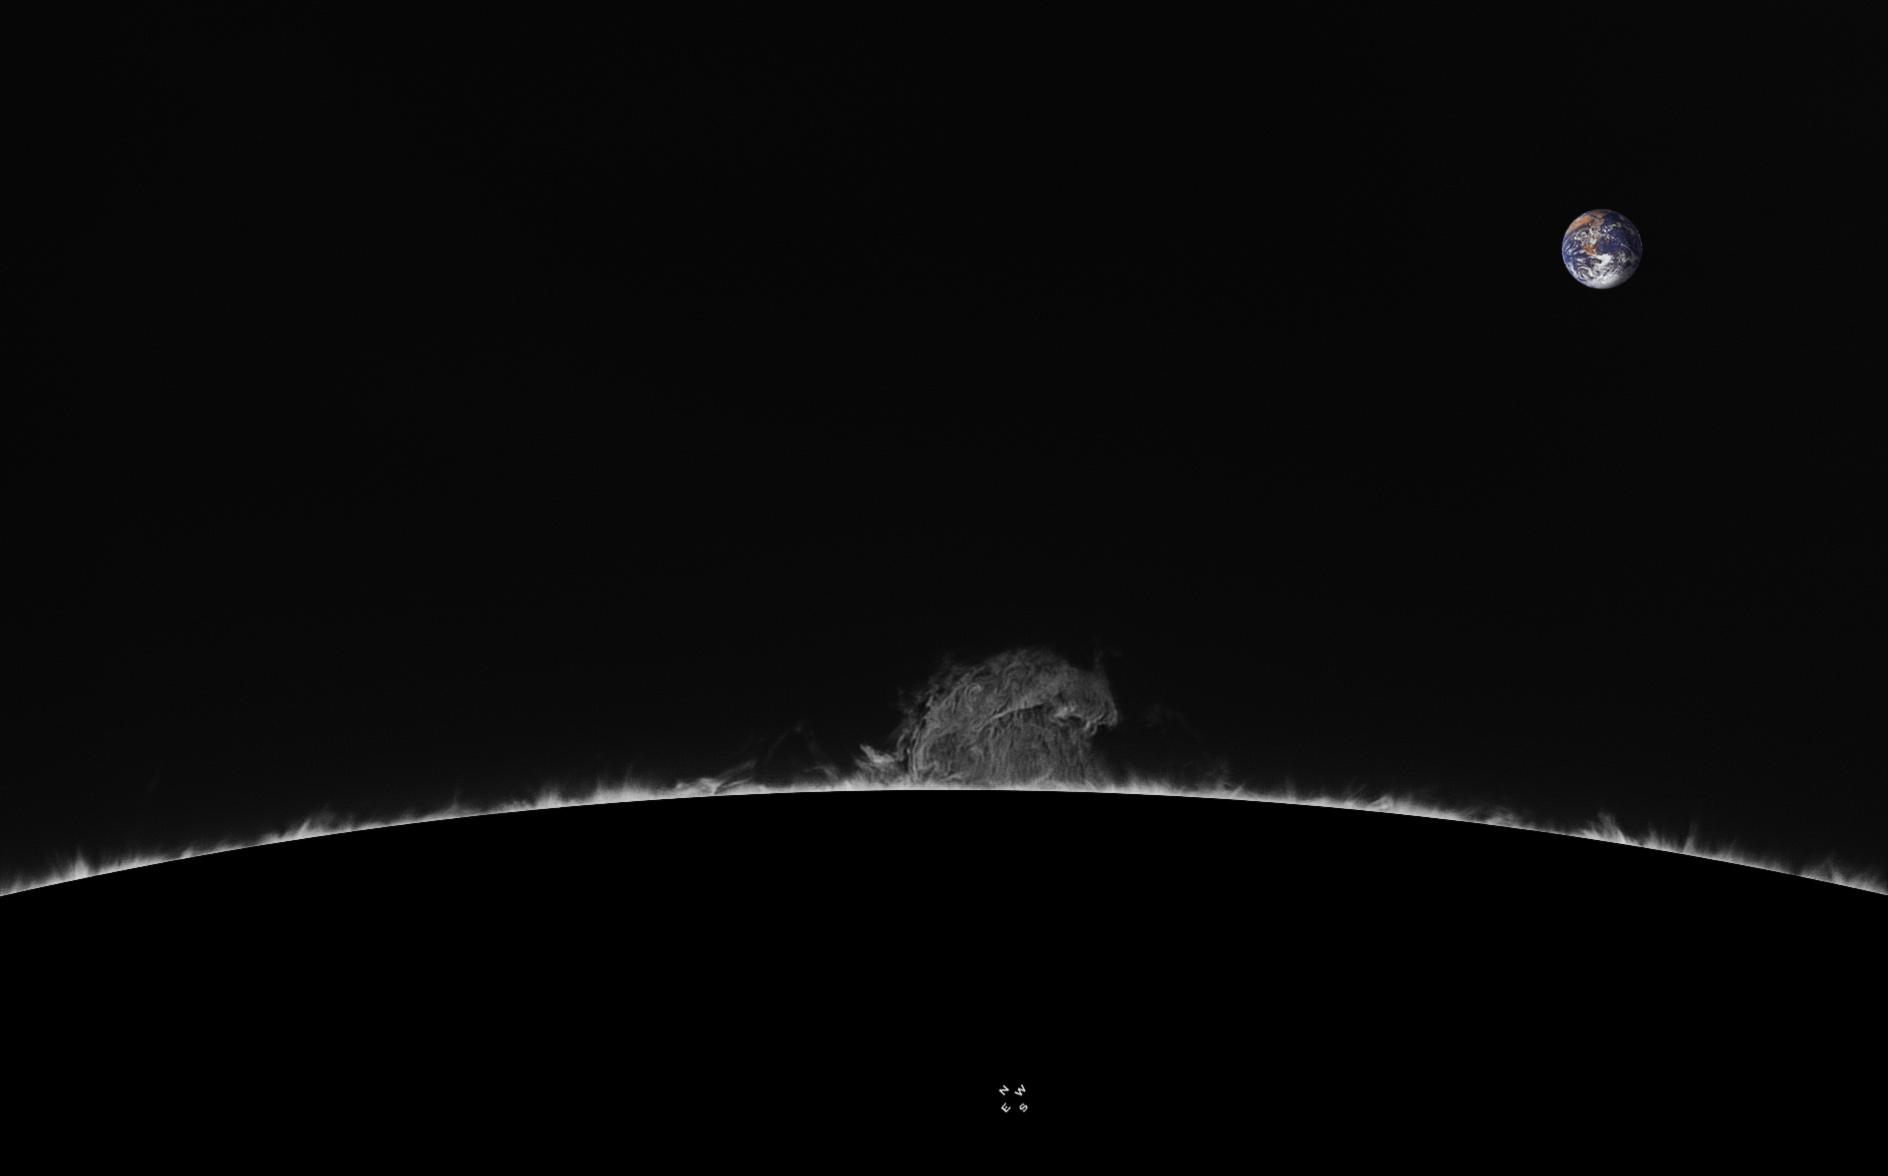 Limbe NW - 55°N - 13 Mai 2018